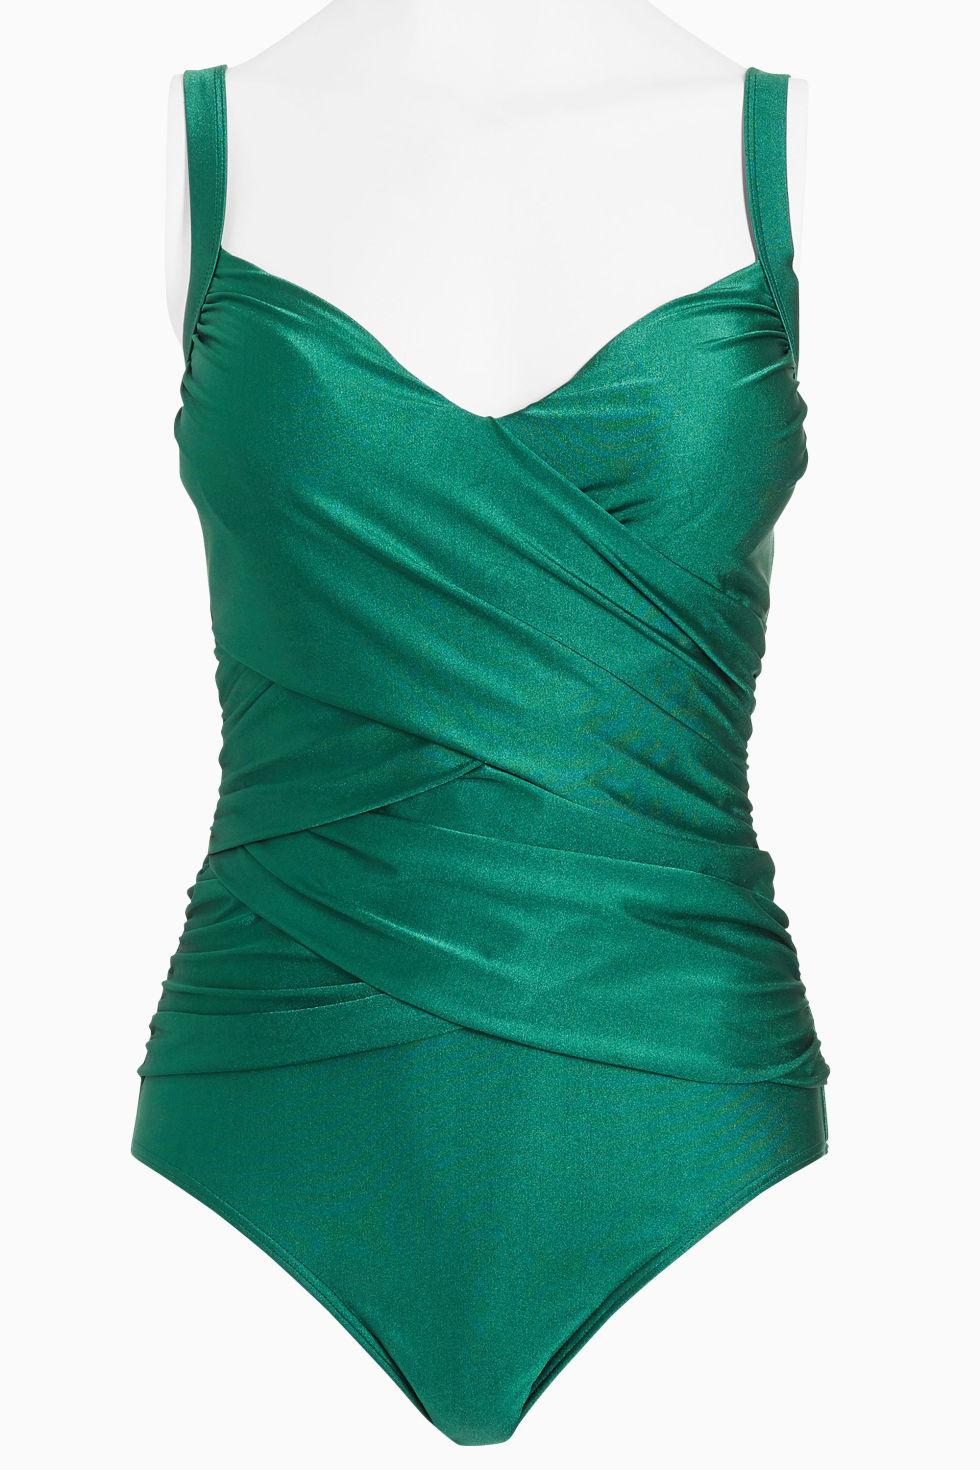 Resultado de imagen de green swimsuit